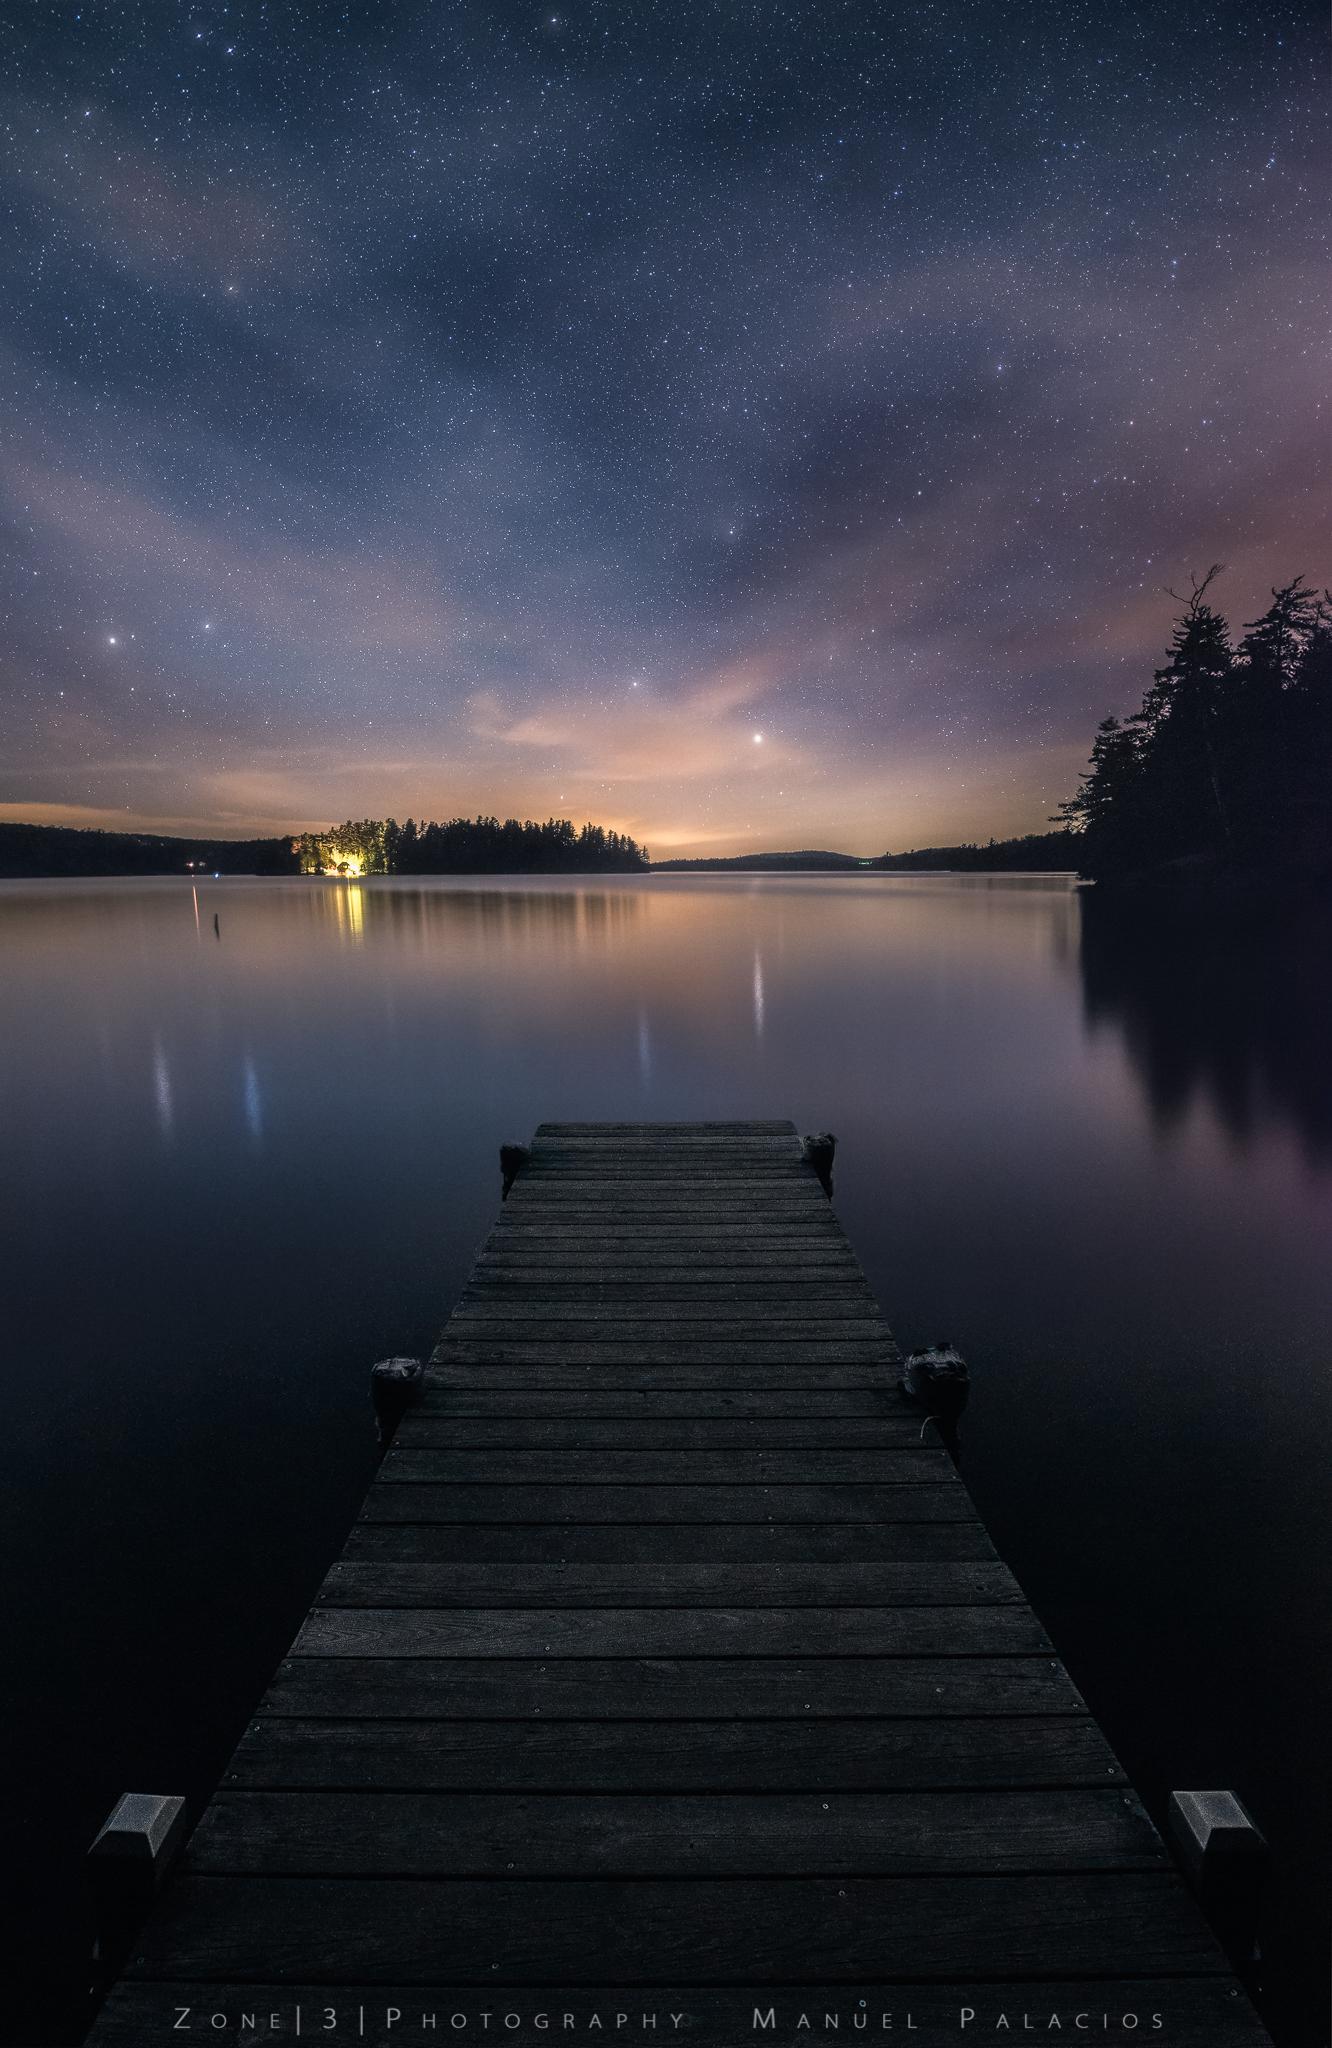 A Starry Night Over Saranac Lake